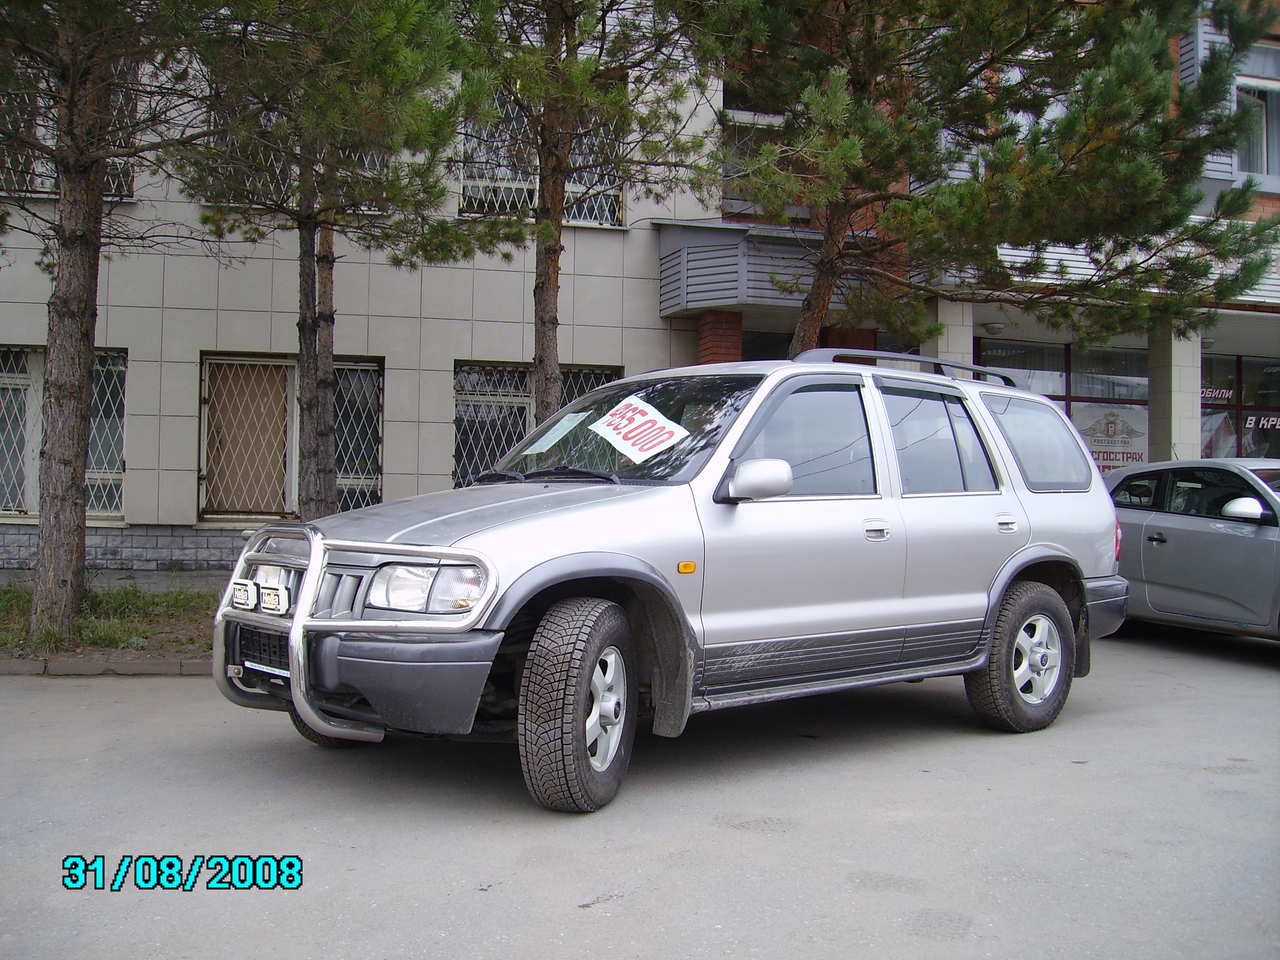 2004 KIA Sportage Pictures, 2000cc., Gasoline, Manual For Sale